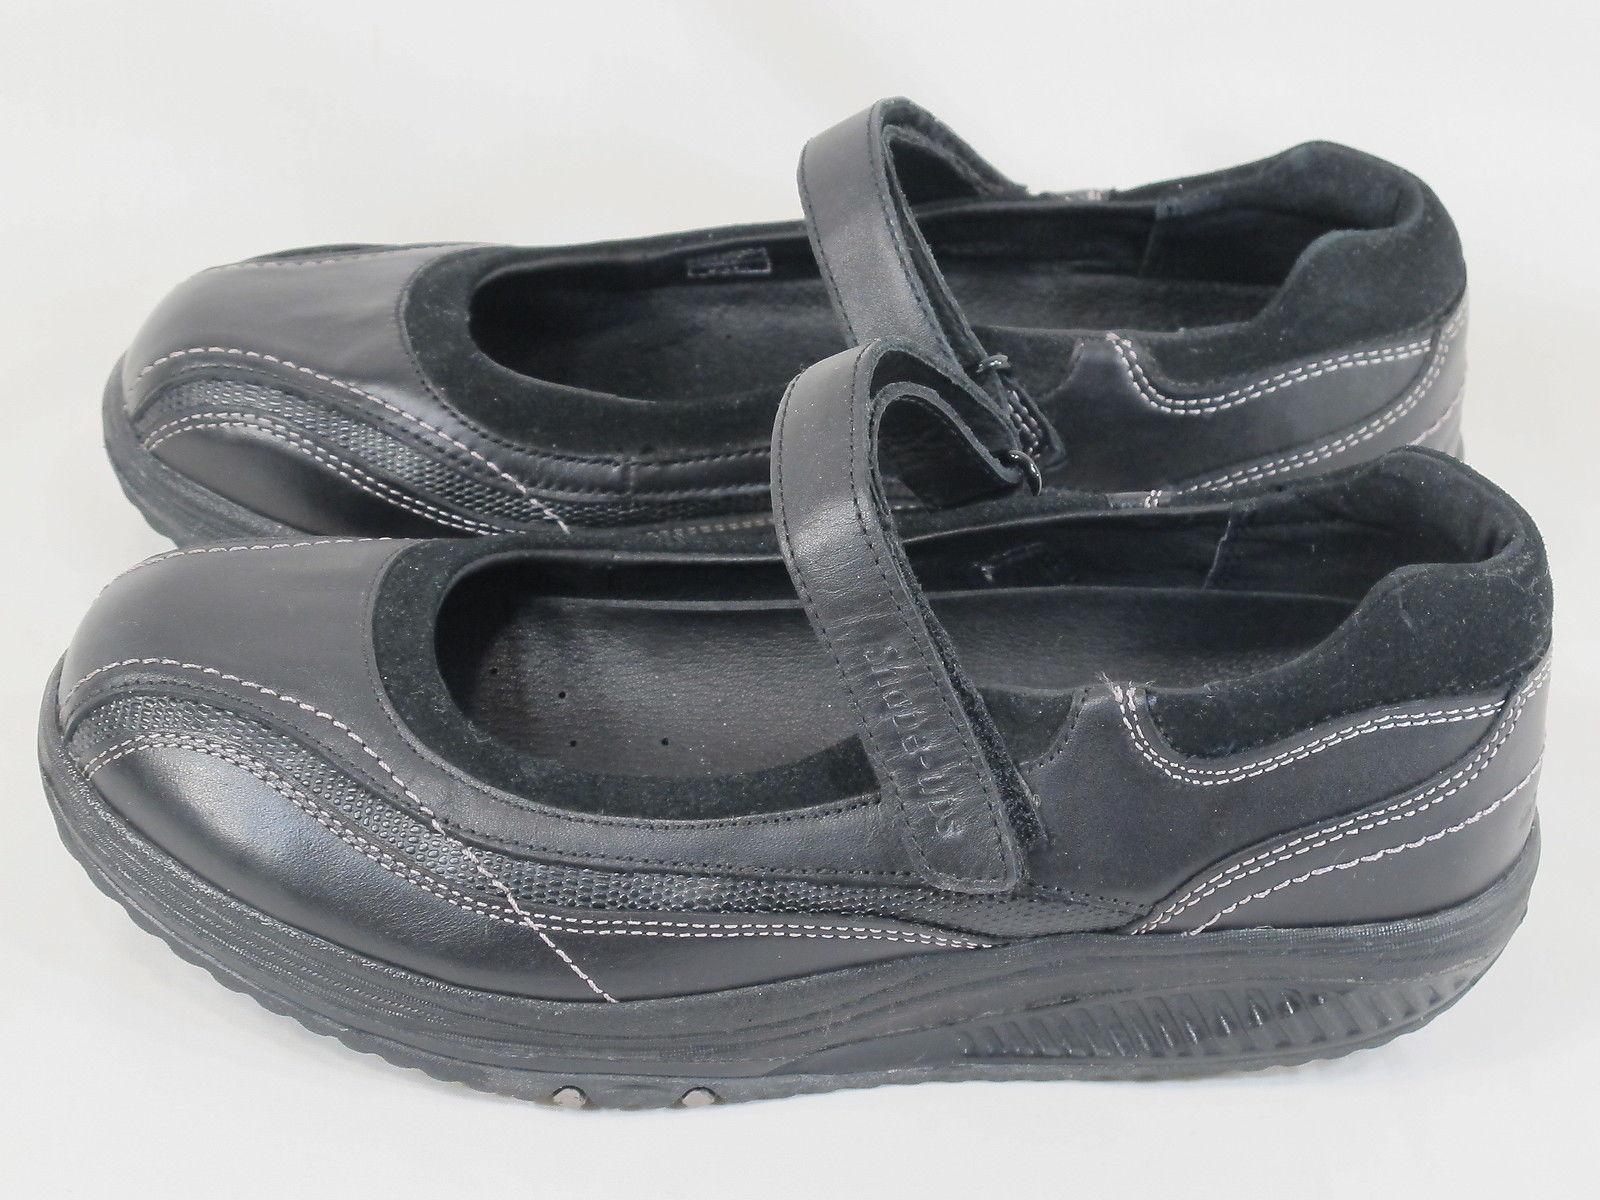 Skechers Black Leather Shape Ups Velcro Mary and 50 similar